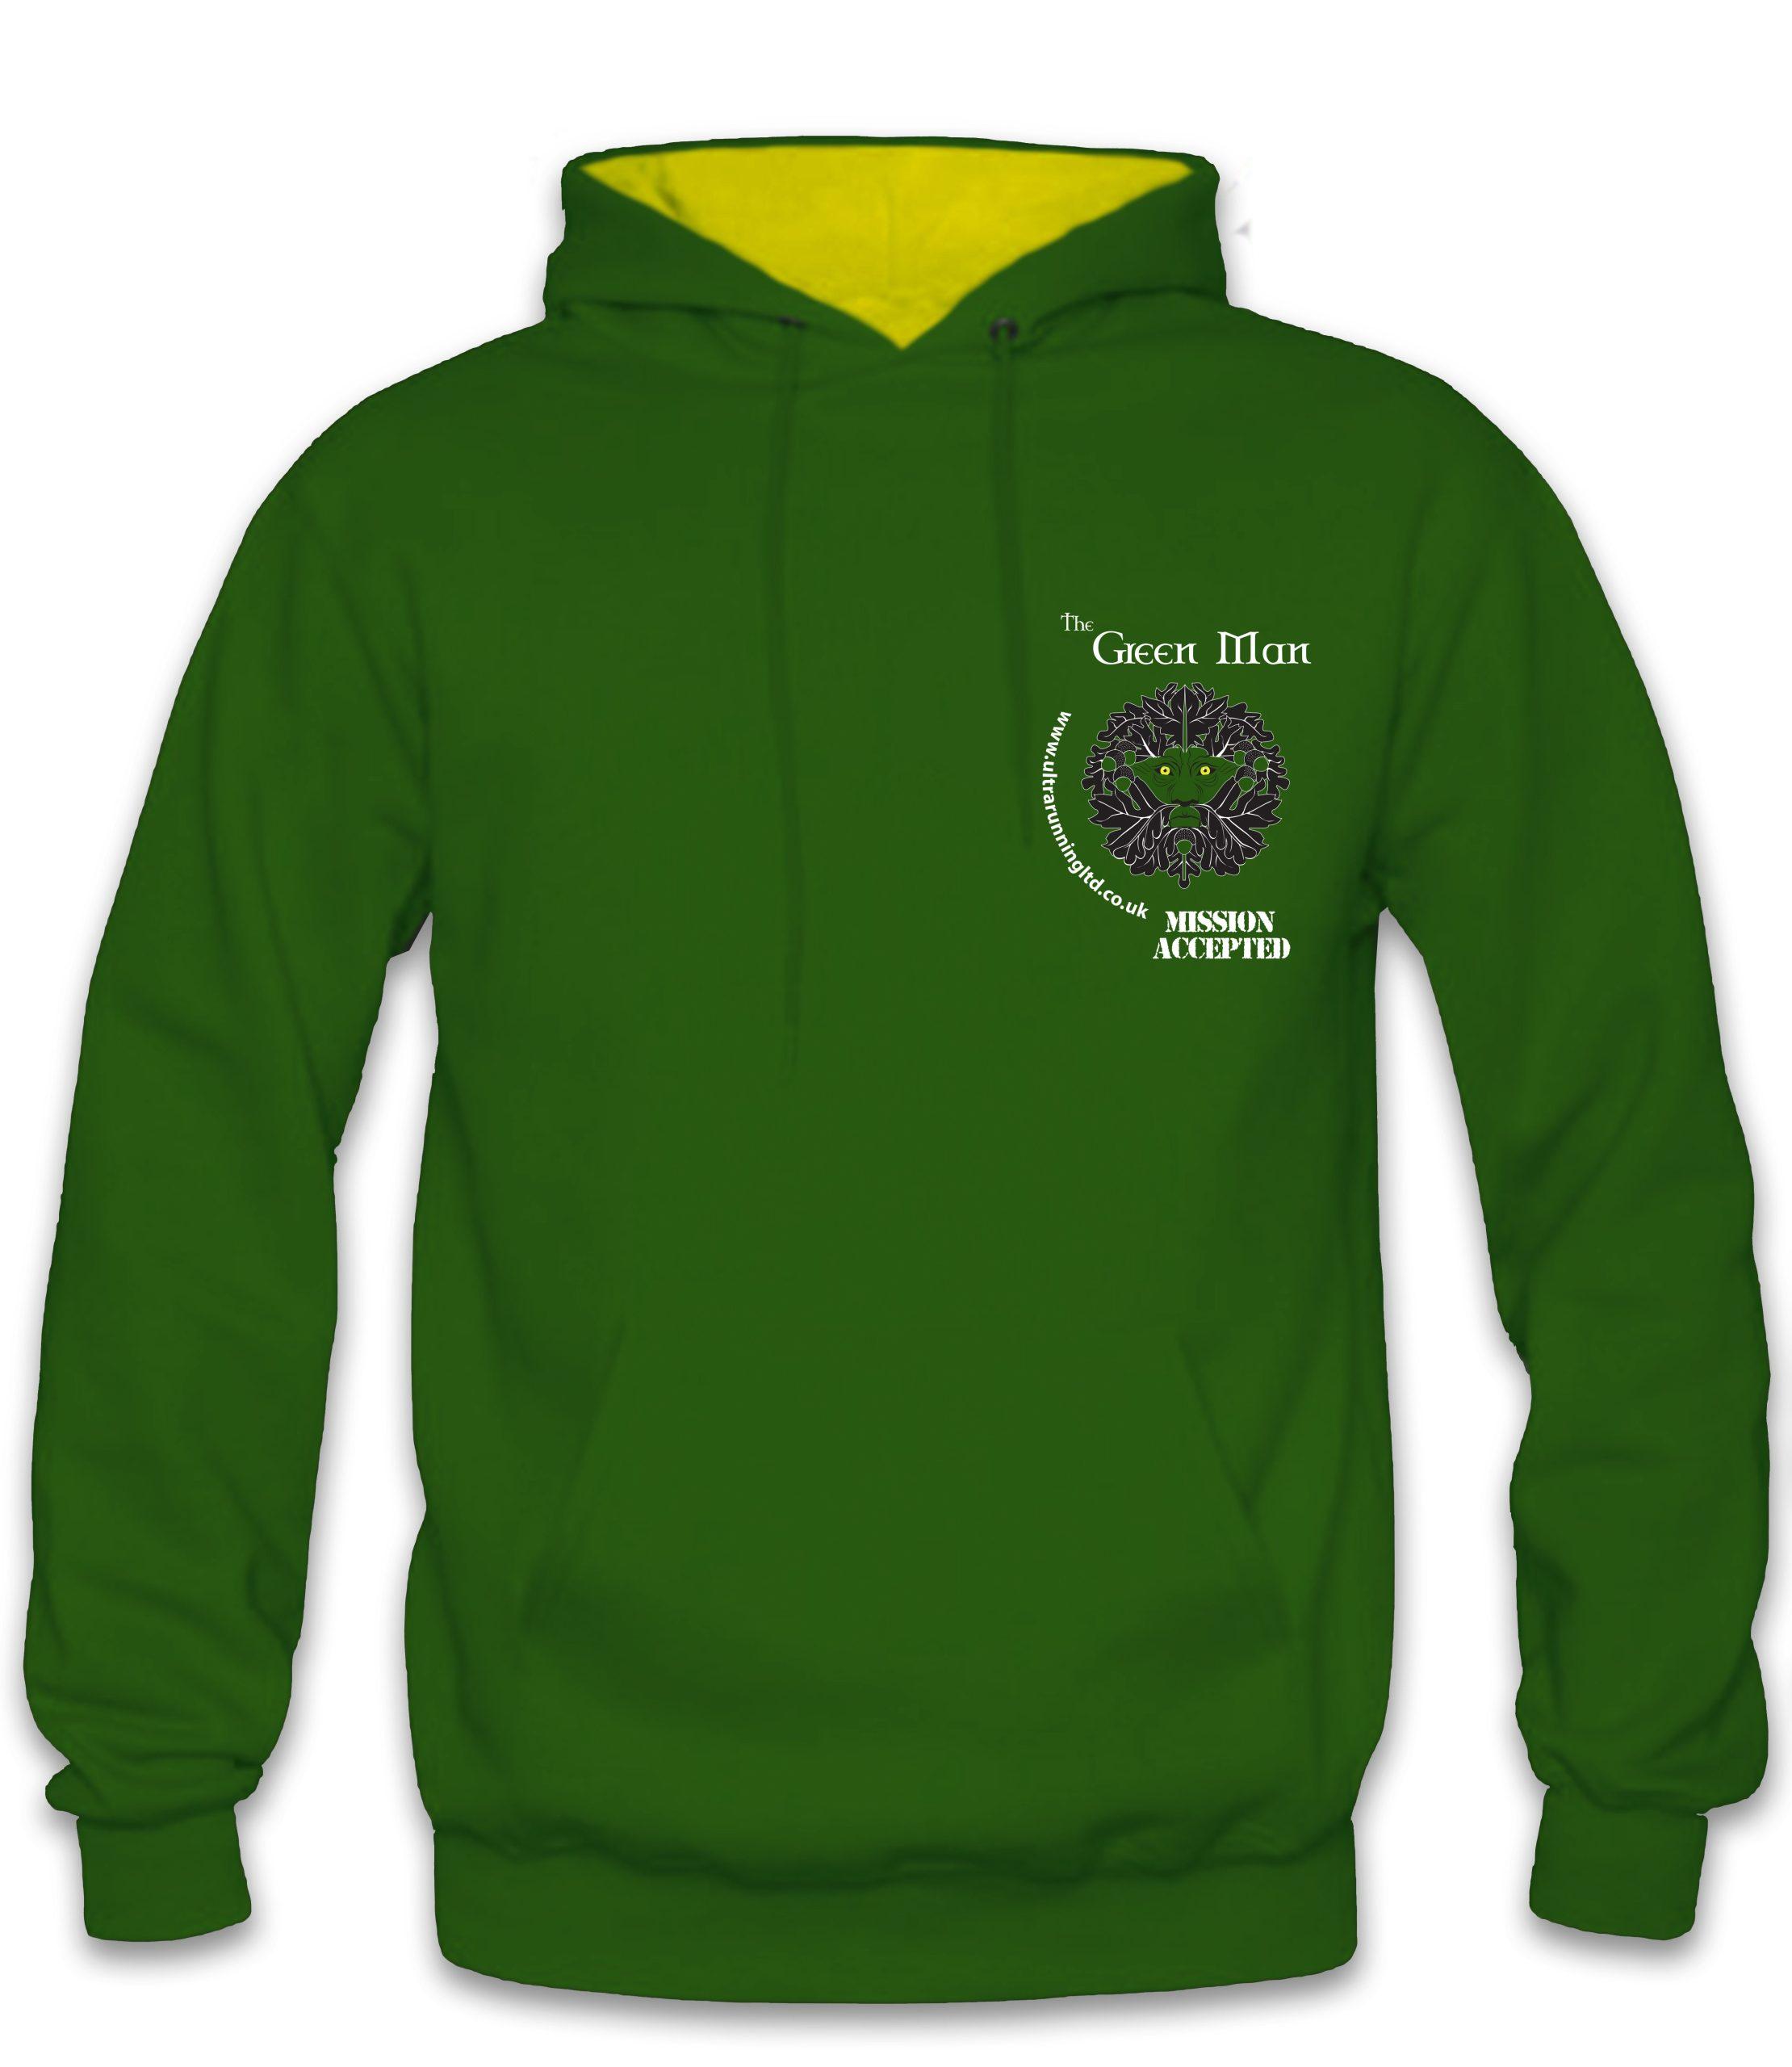 The Green Man Hoody